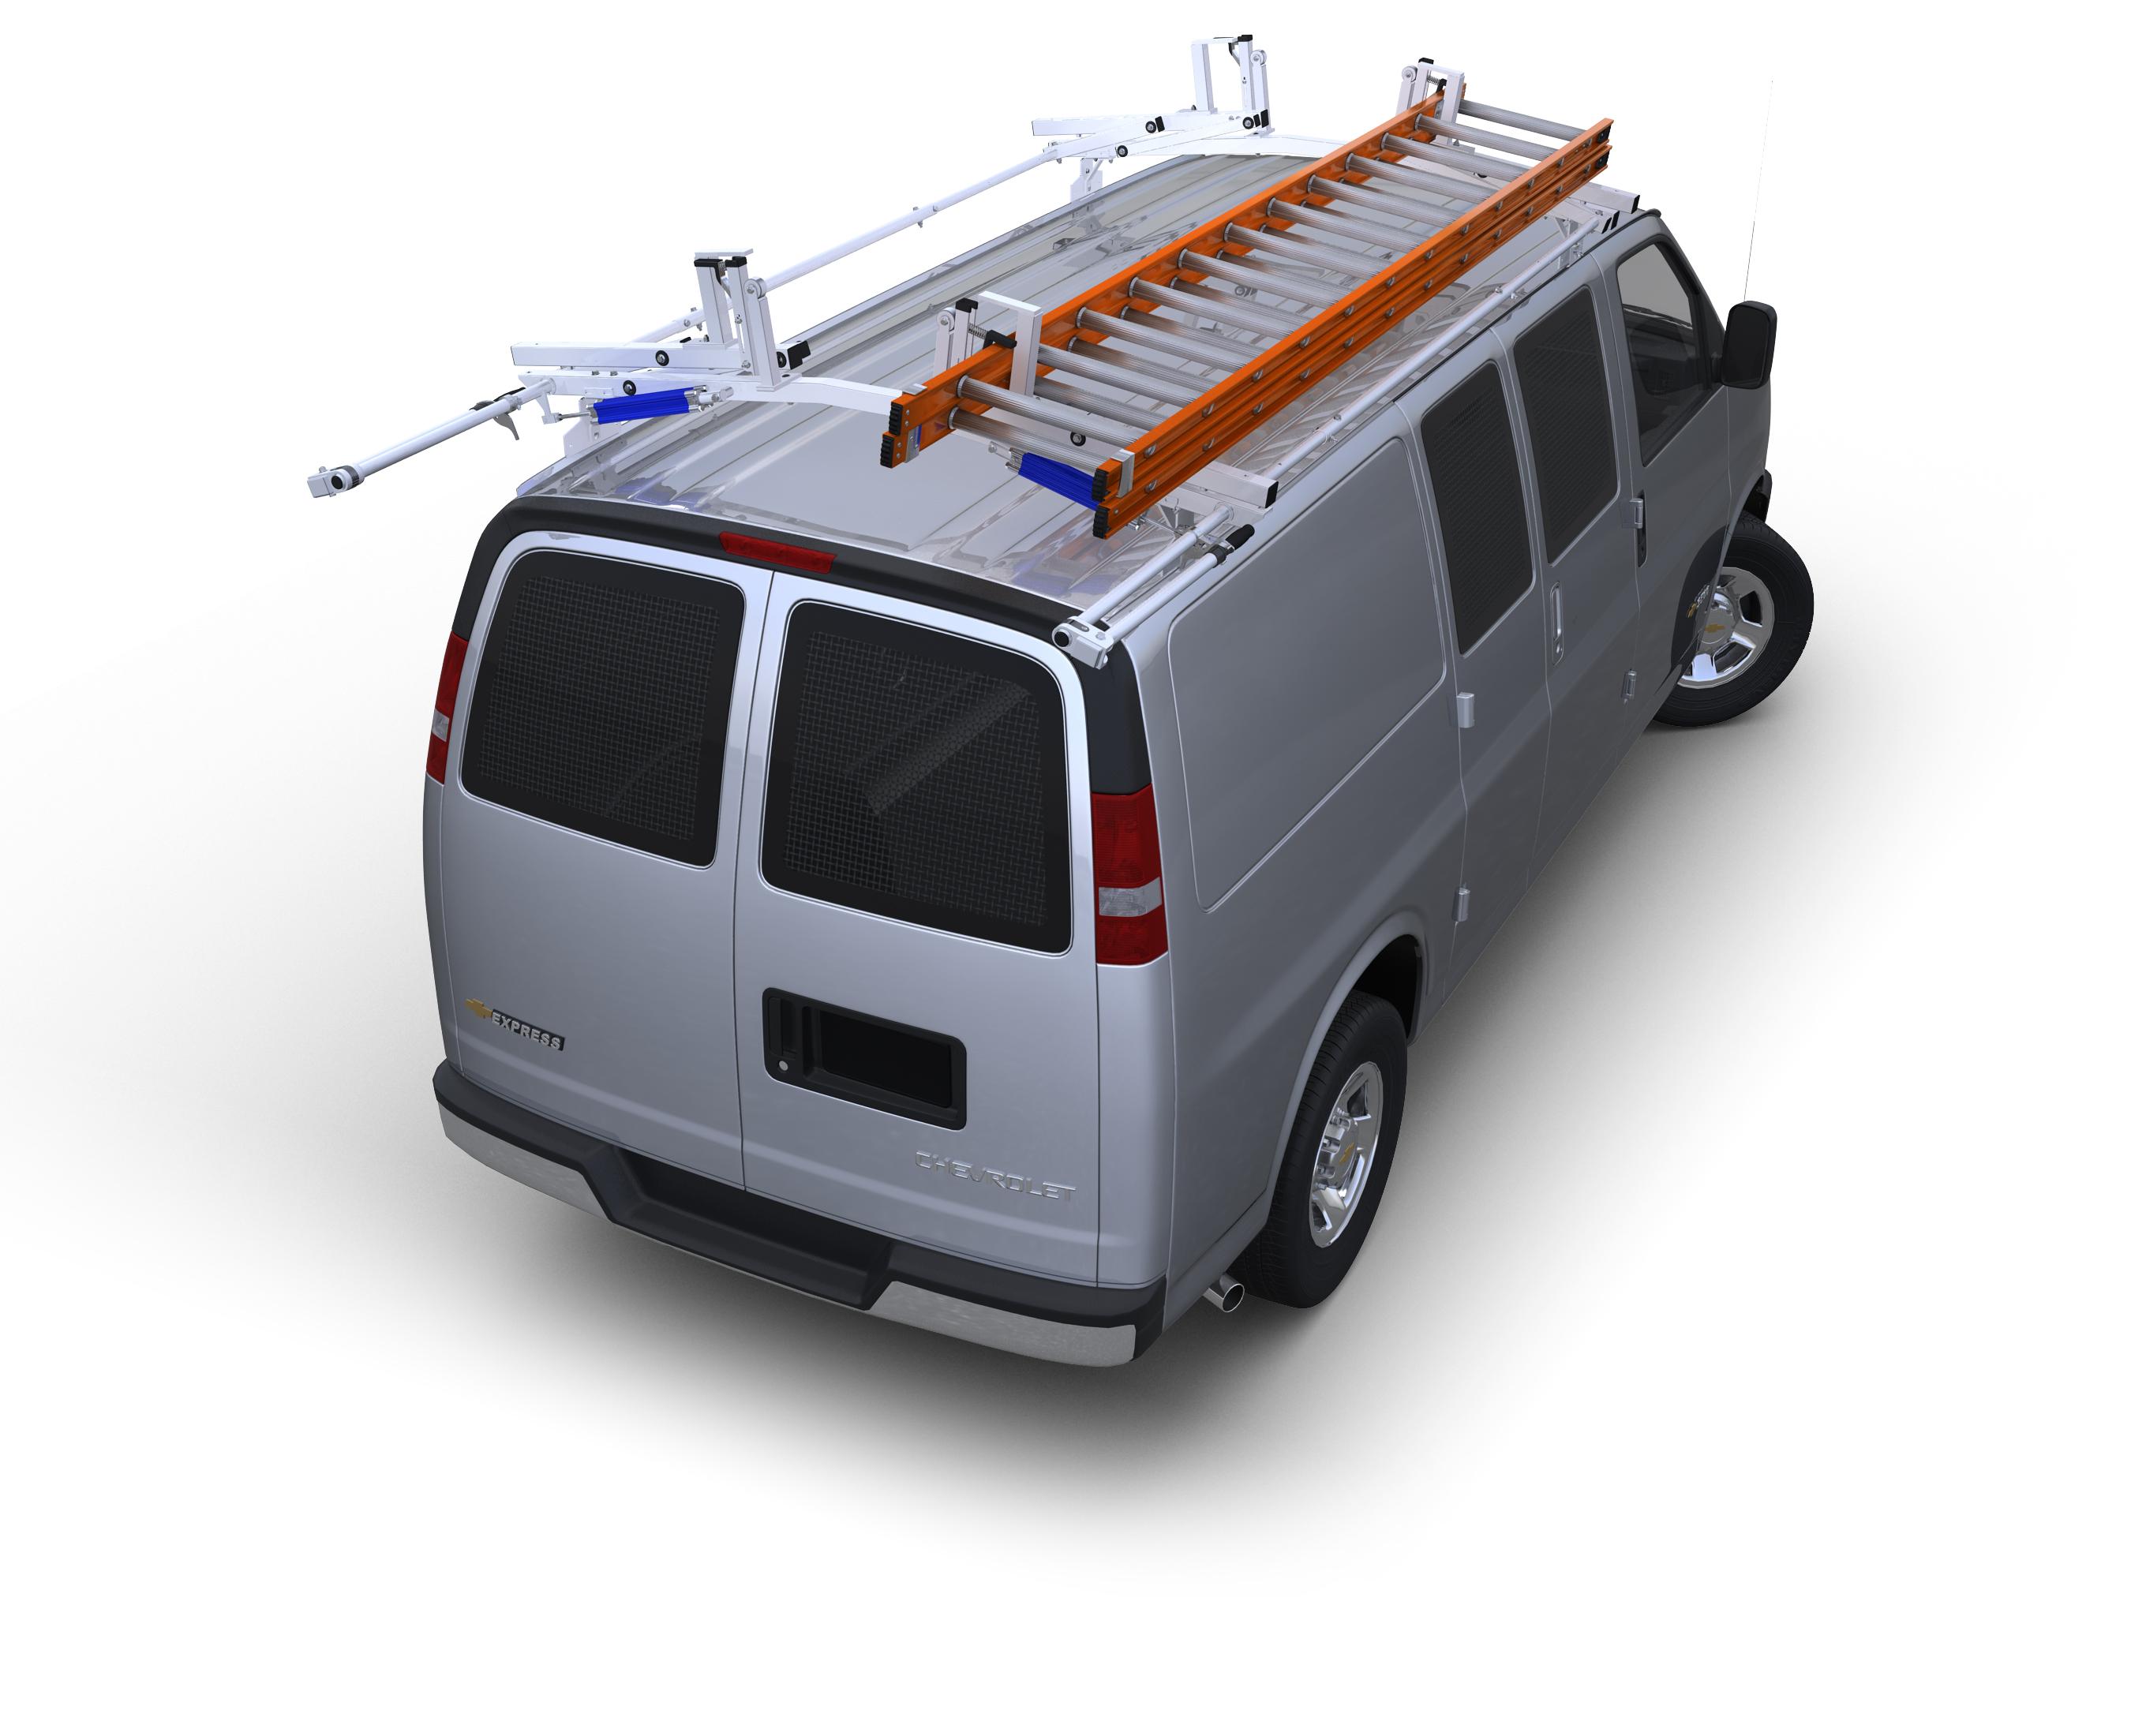 Backrack Pick-Up Truck Rack Complete w/ All Mounting Brackets & Hardware